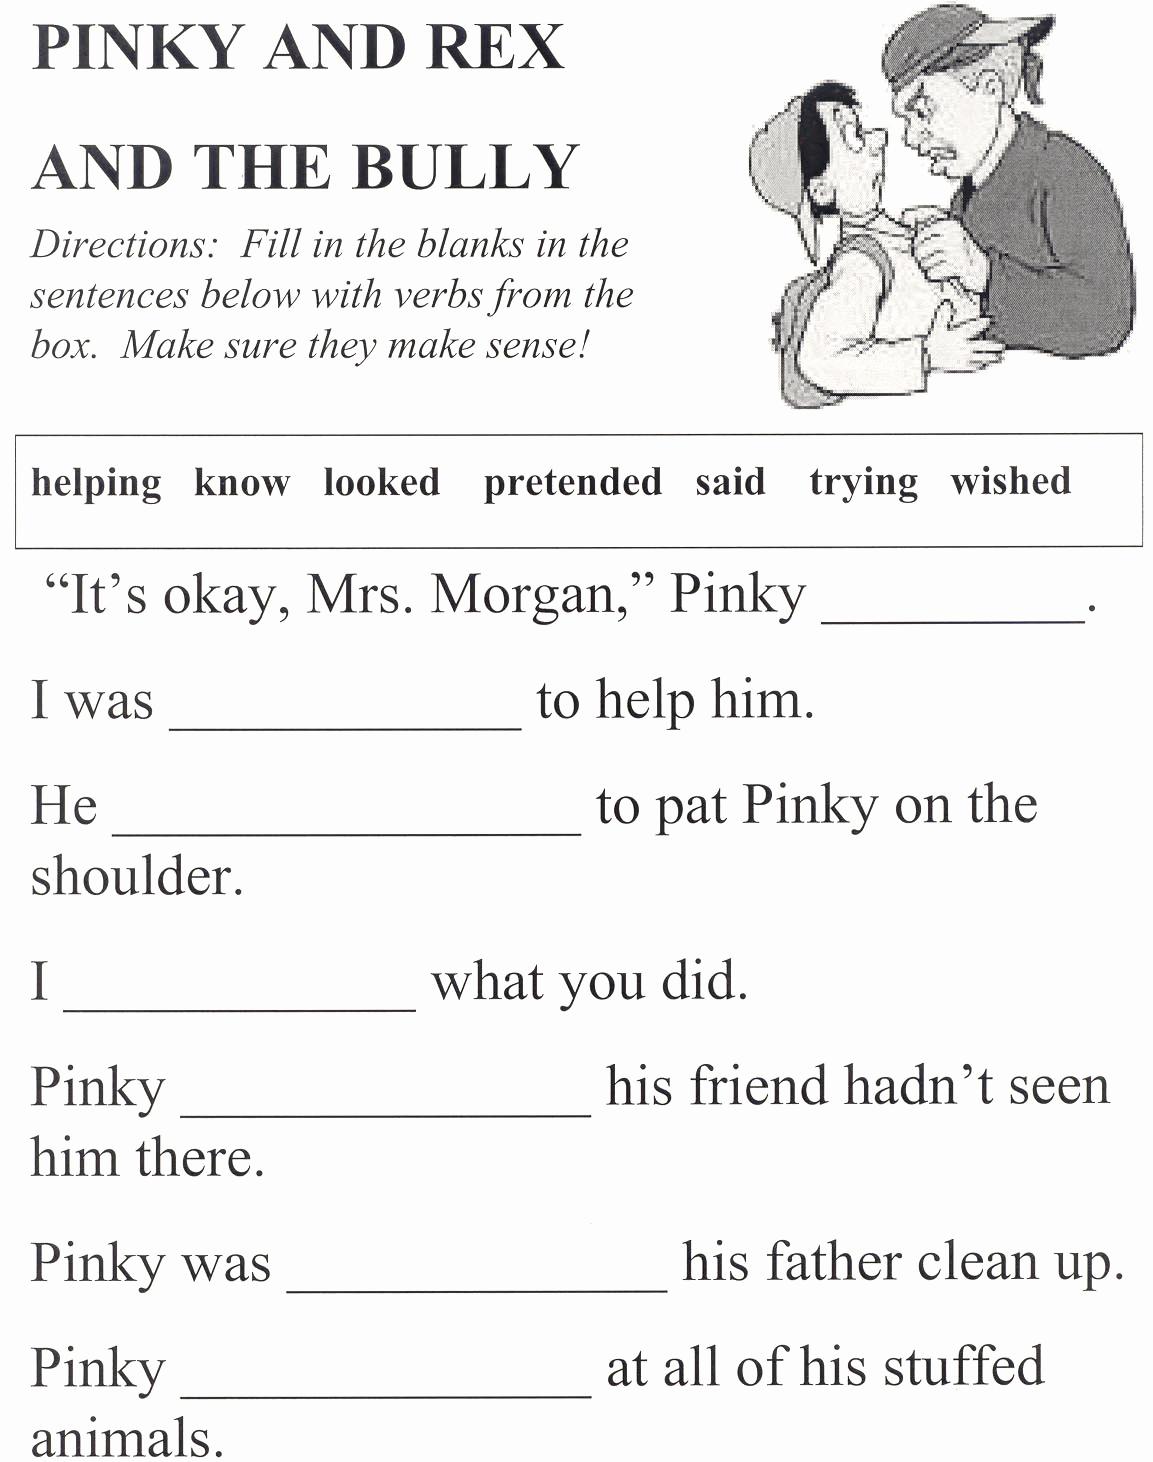 Printable Bullying Worksheets Lovely Printables Anti Bullying Worksheets Kigose Thousands